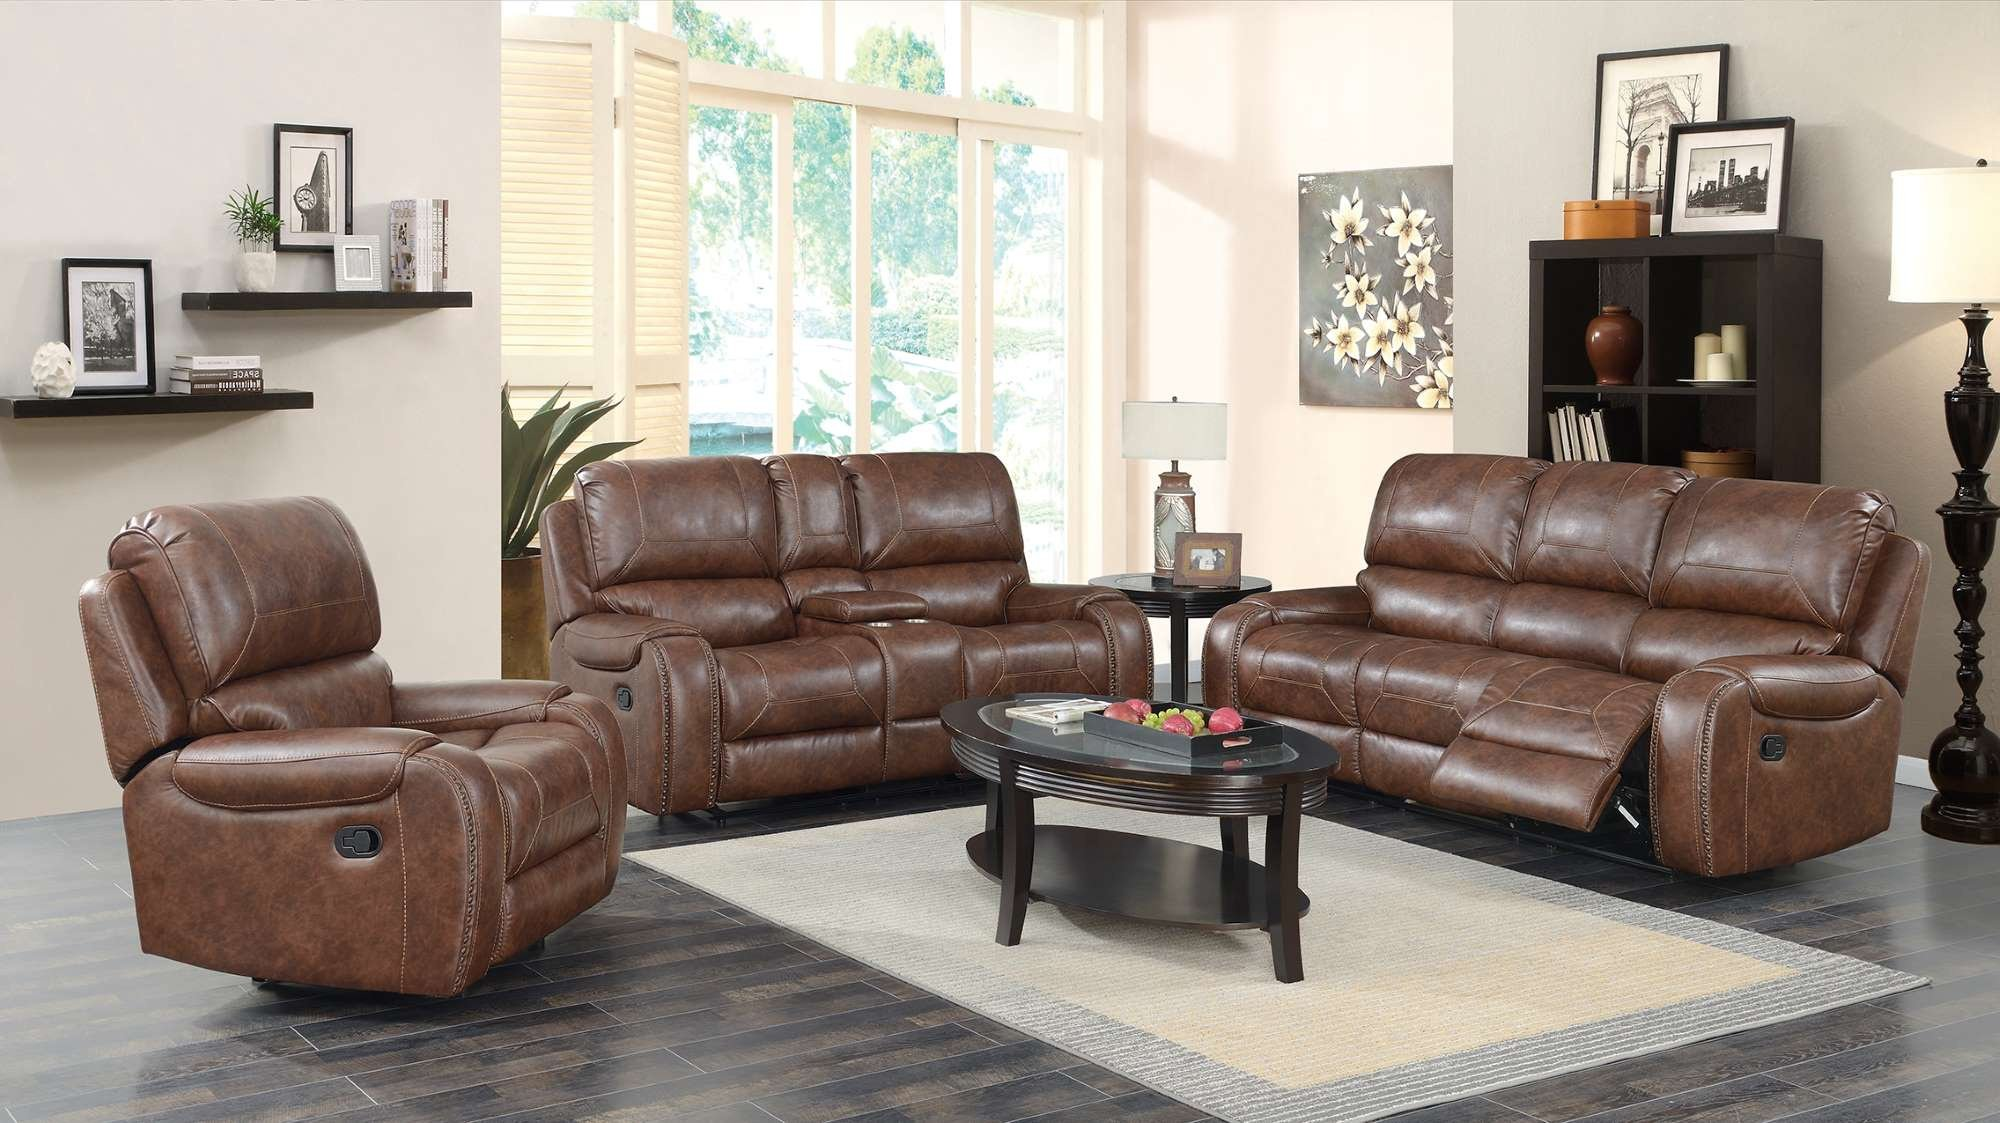 LRPX2995 Caramel Reclining Sofa and Loveseat